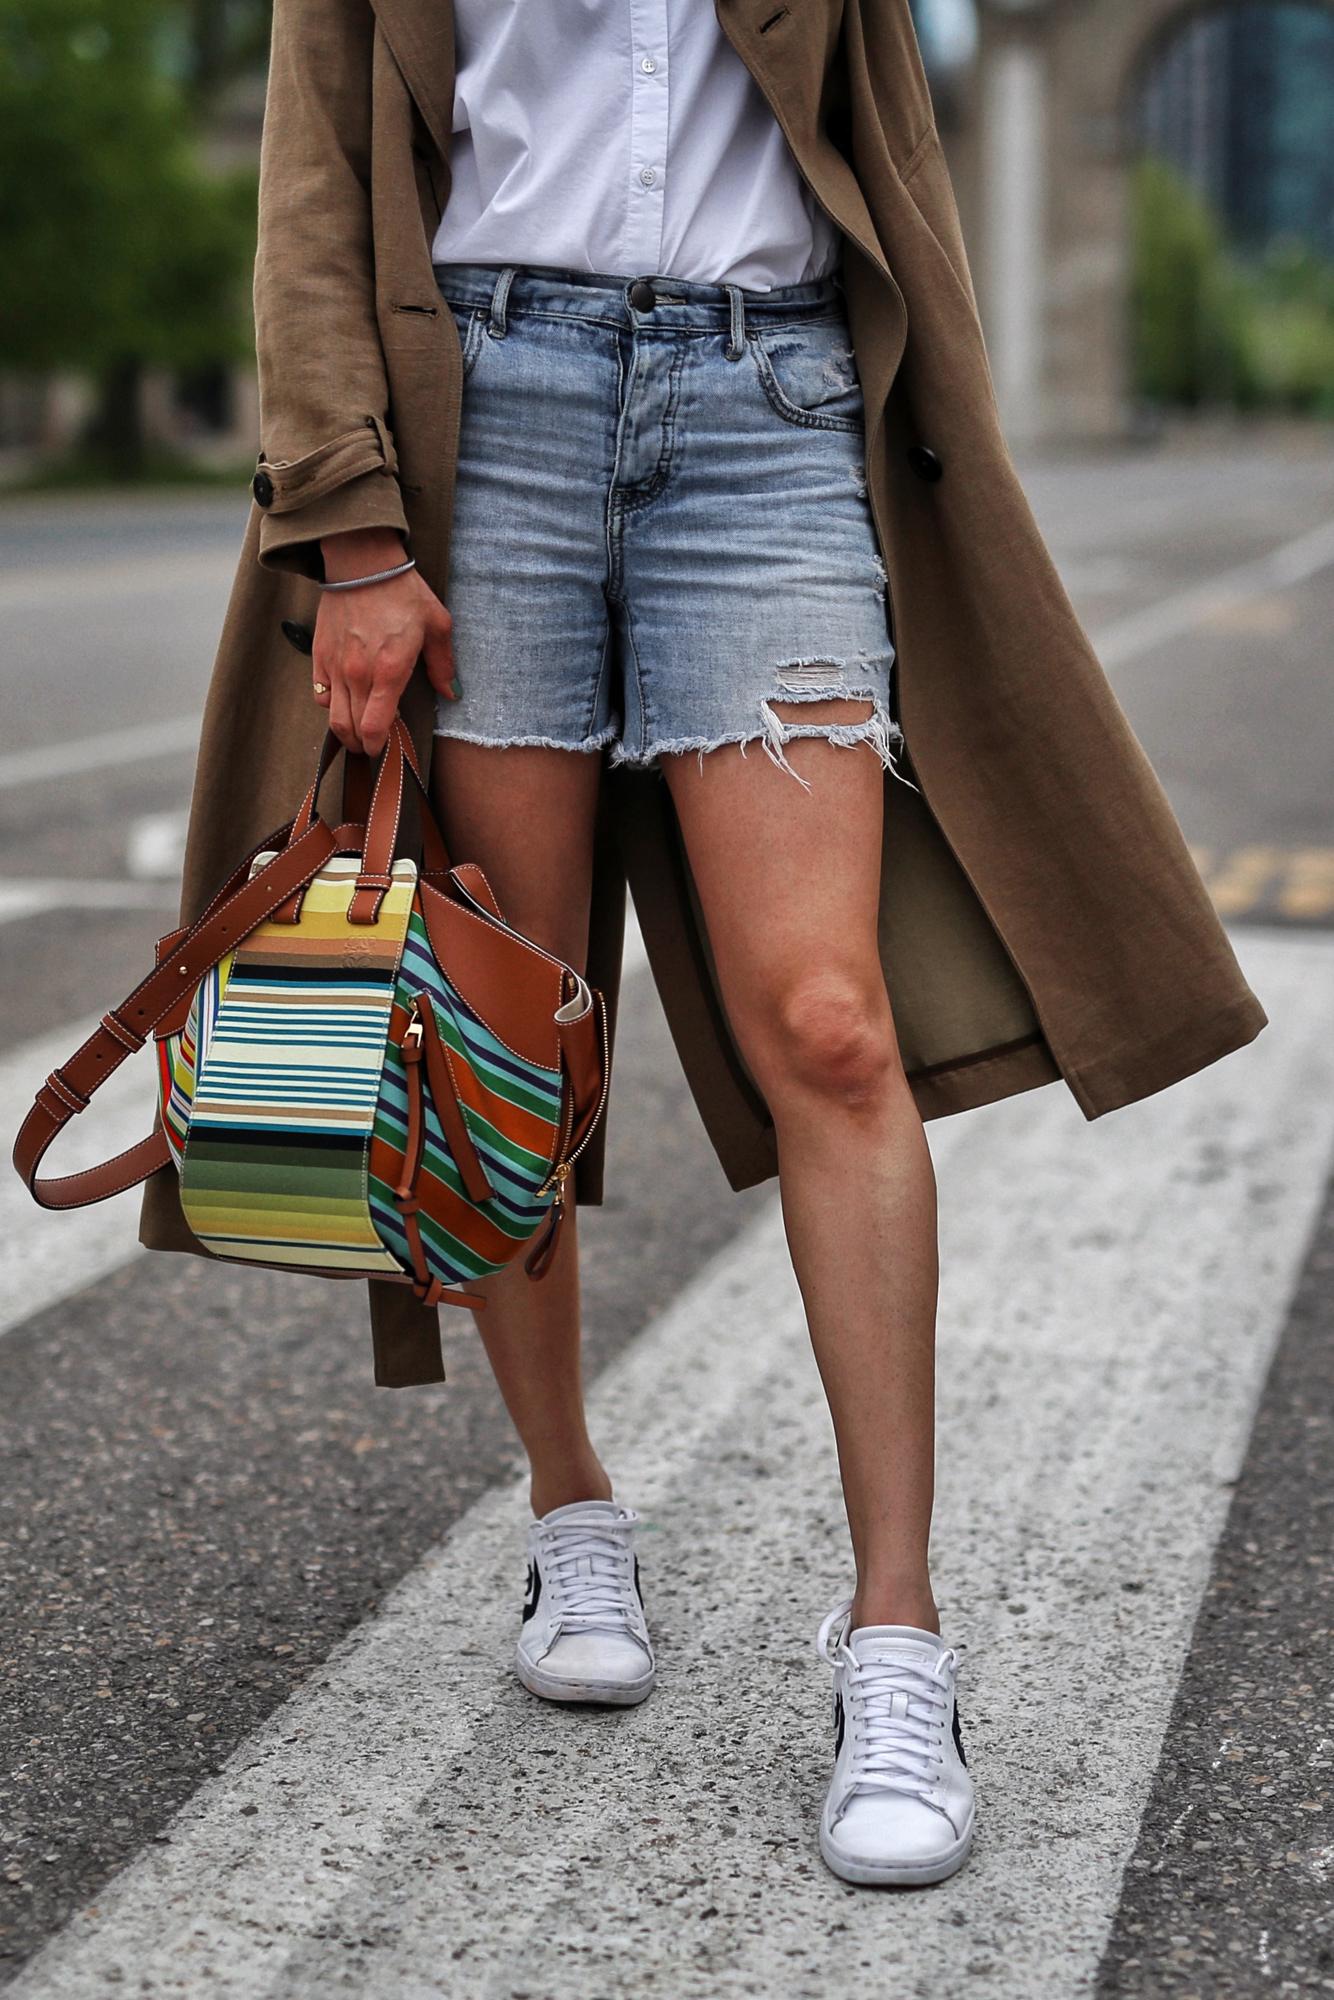 woahstyle.com 2018 - zara linen trench coat, free people cut off shorts, converse one stars, loewe striped small hammock bag, white button up shirt - toronto street style - hotel x - nathalie martin 10.jpg